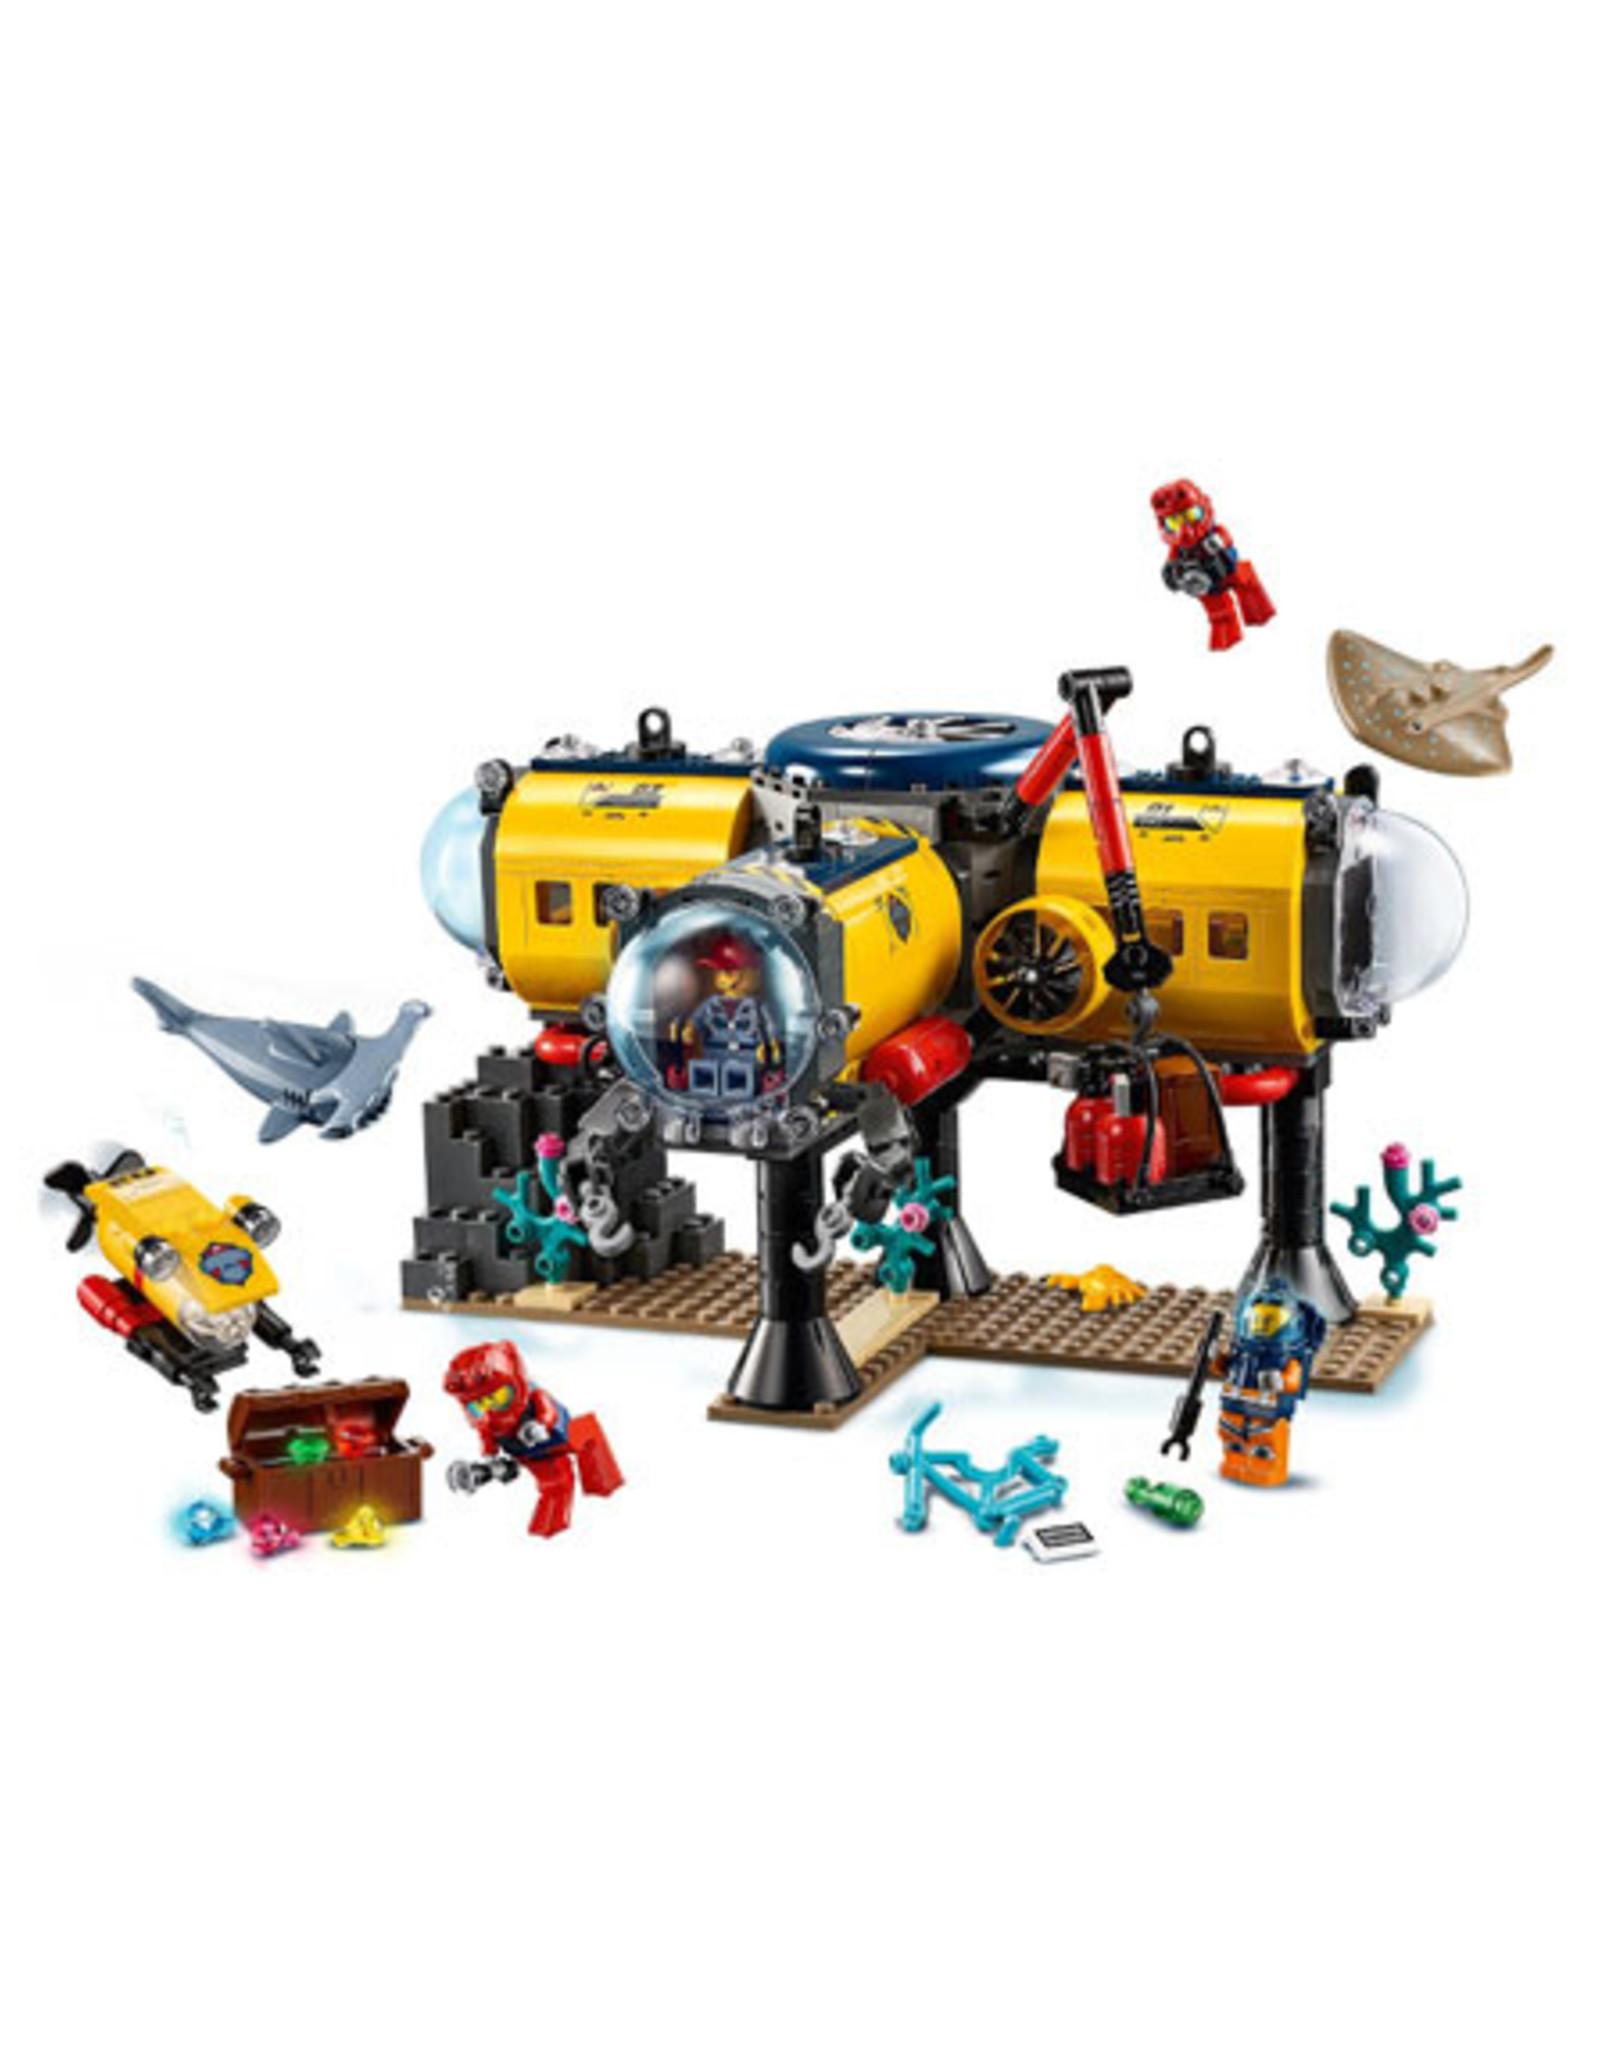 LEGO LEGO 60265 Ocean Exploration Base CITY